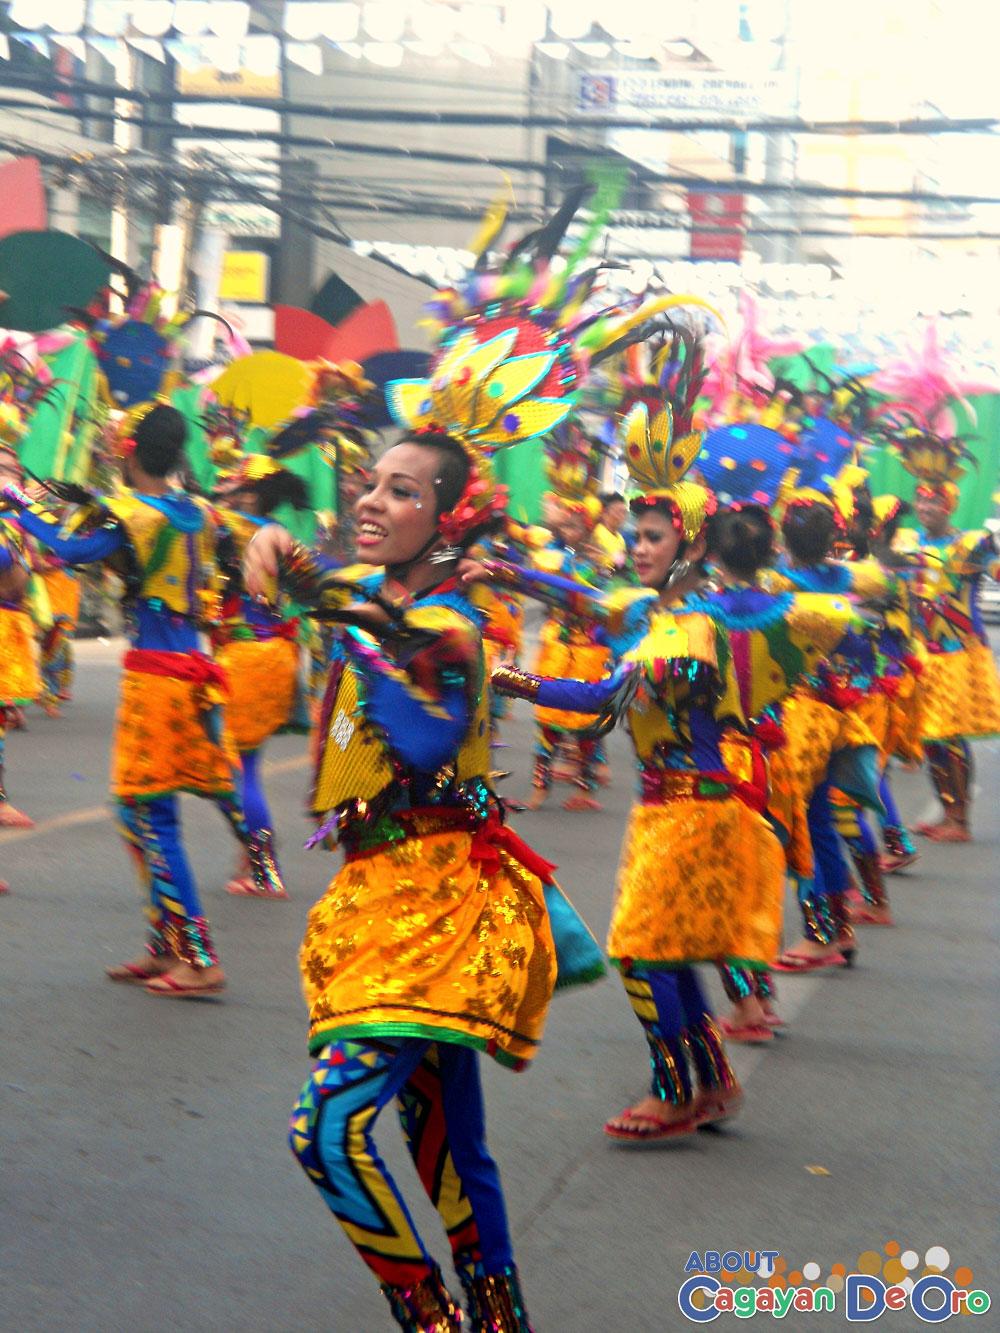 Barangay Carmen Carnival Parade - Cagayan de Oro Carnival Parade